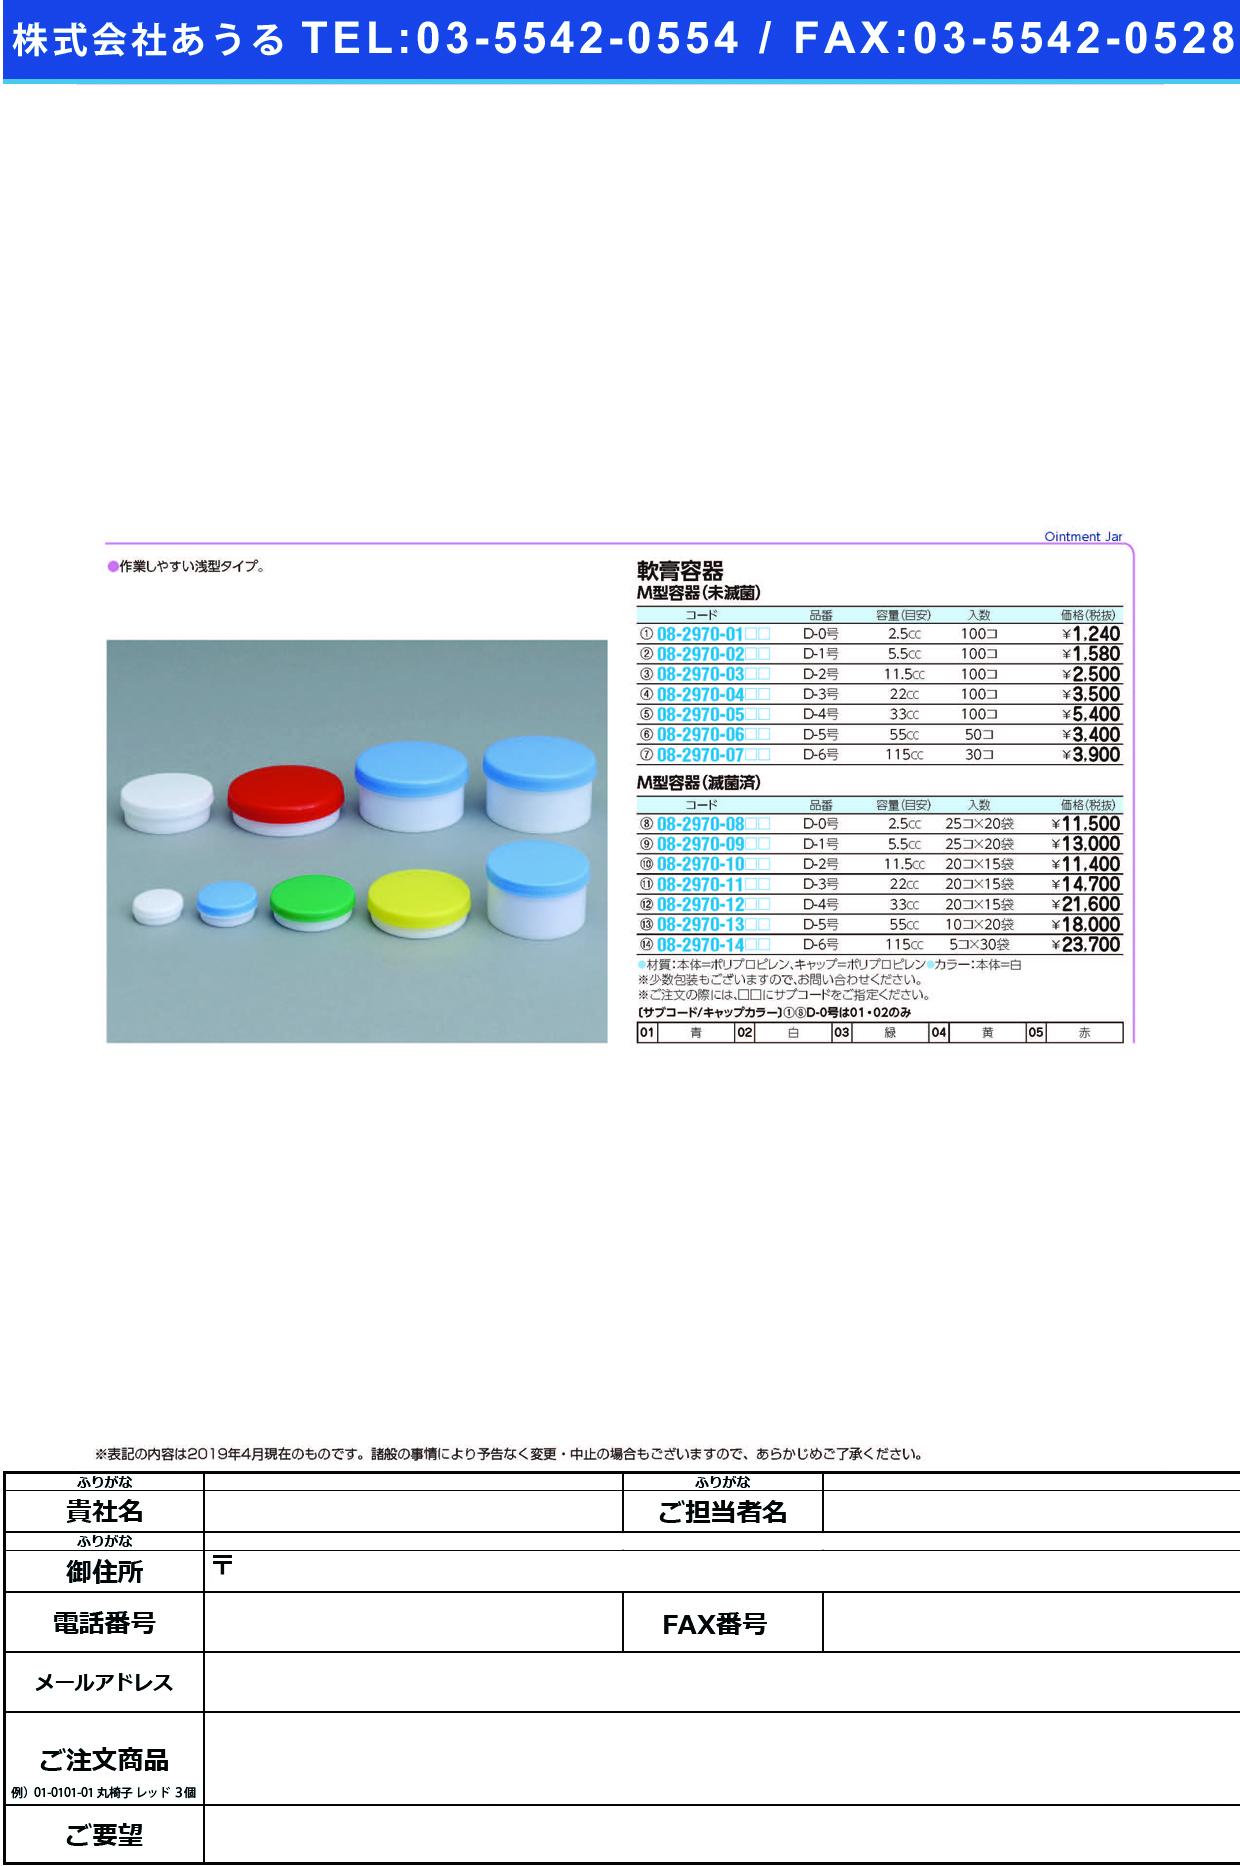 (08-2970-09)M型容器D−1(滅菌済) 5.5CC(25コX20フクロイリ) MガタヨウキD-1(メッキンズミ) キャップ:青(エムアイケミカル)【1梱単位】【2019年カタログ商品】